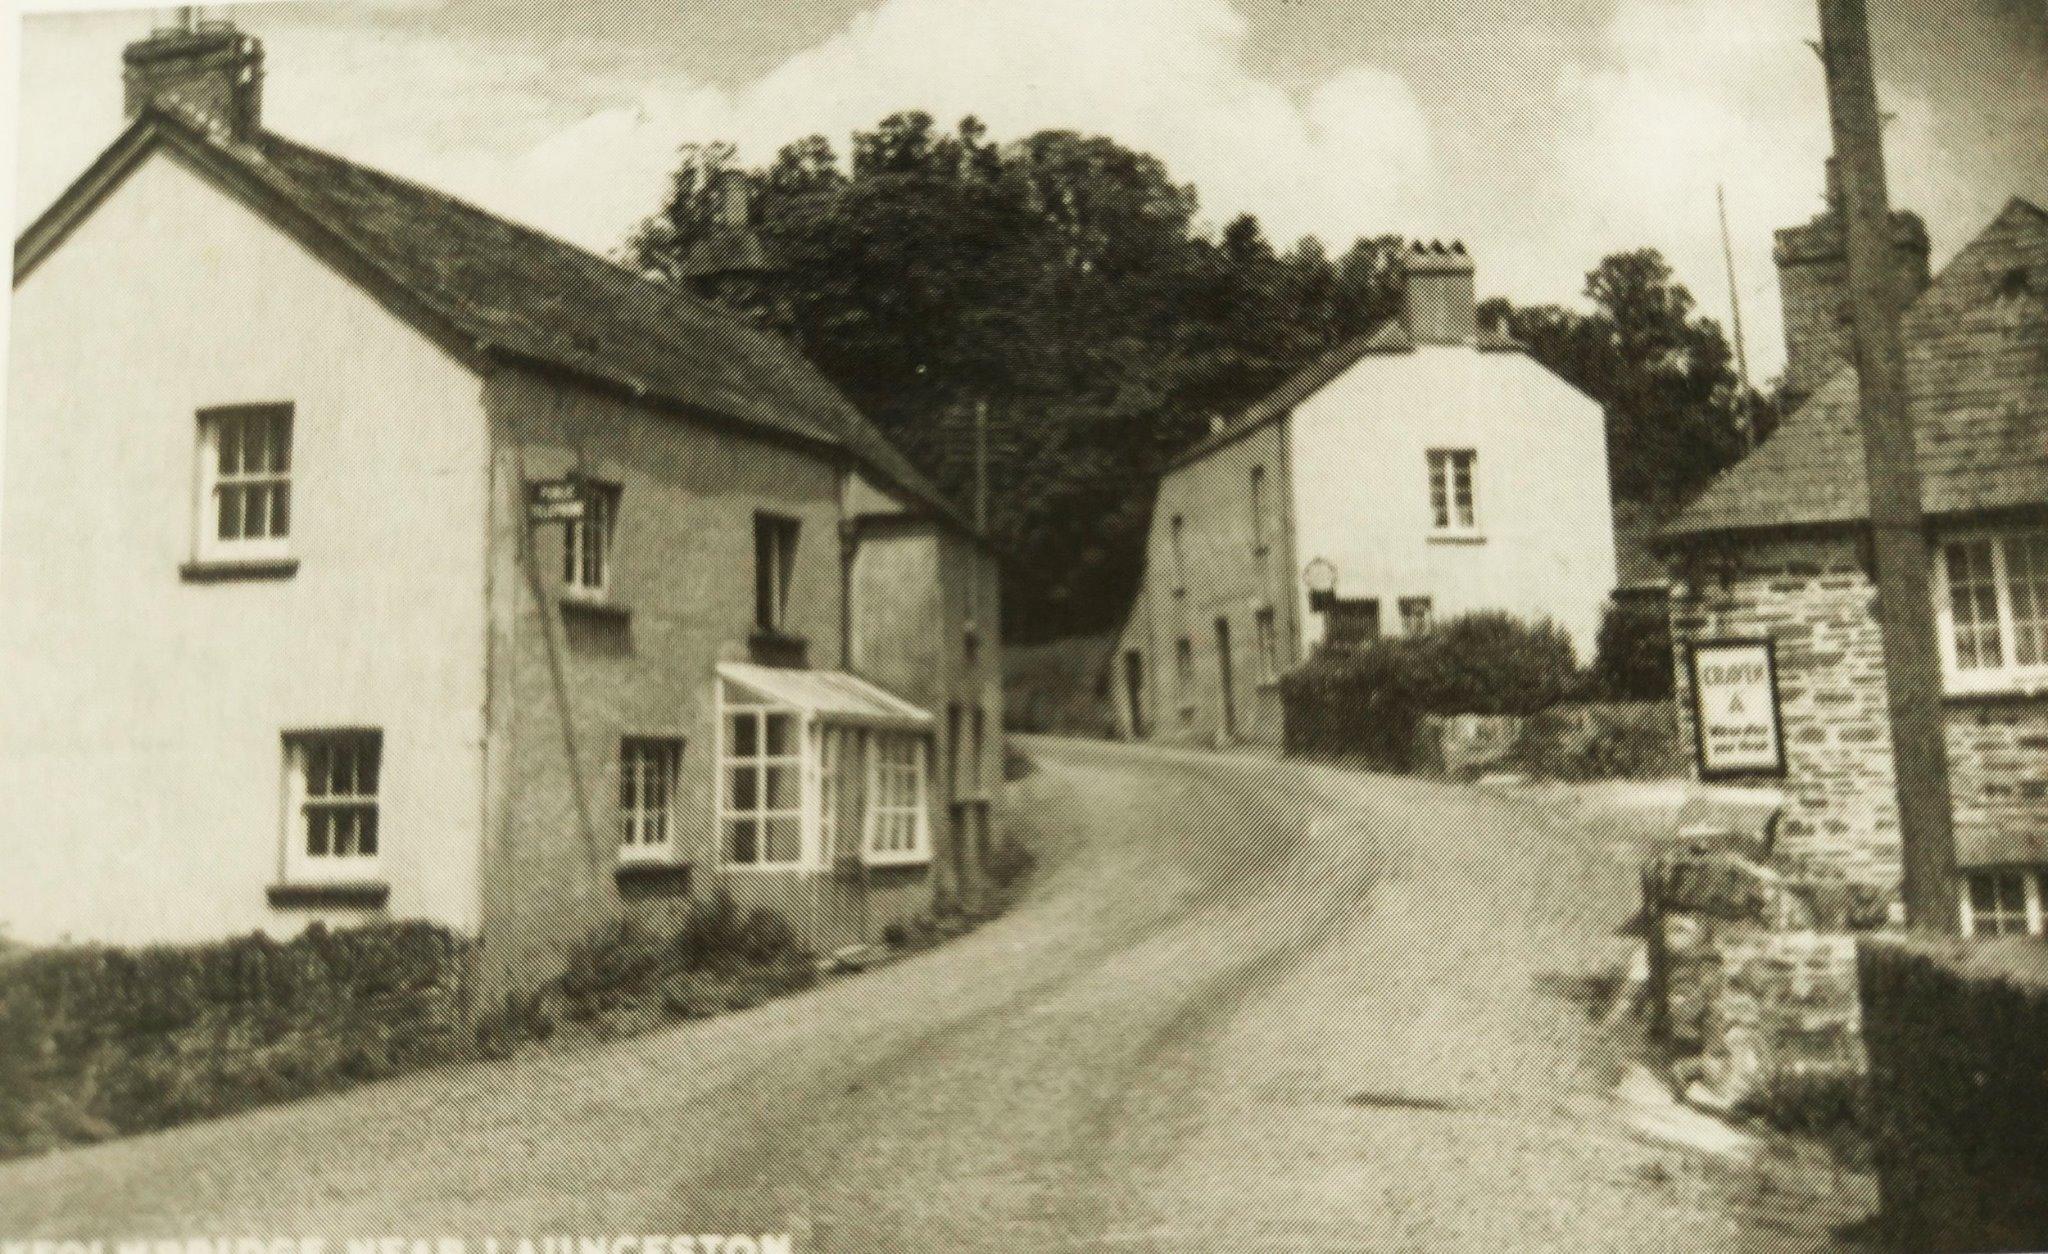 yeolmbridge-before-the-road-widening-after-ww2-photo-courtesy-of-gary-lashbrook